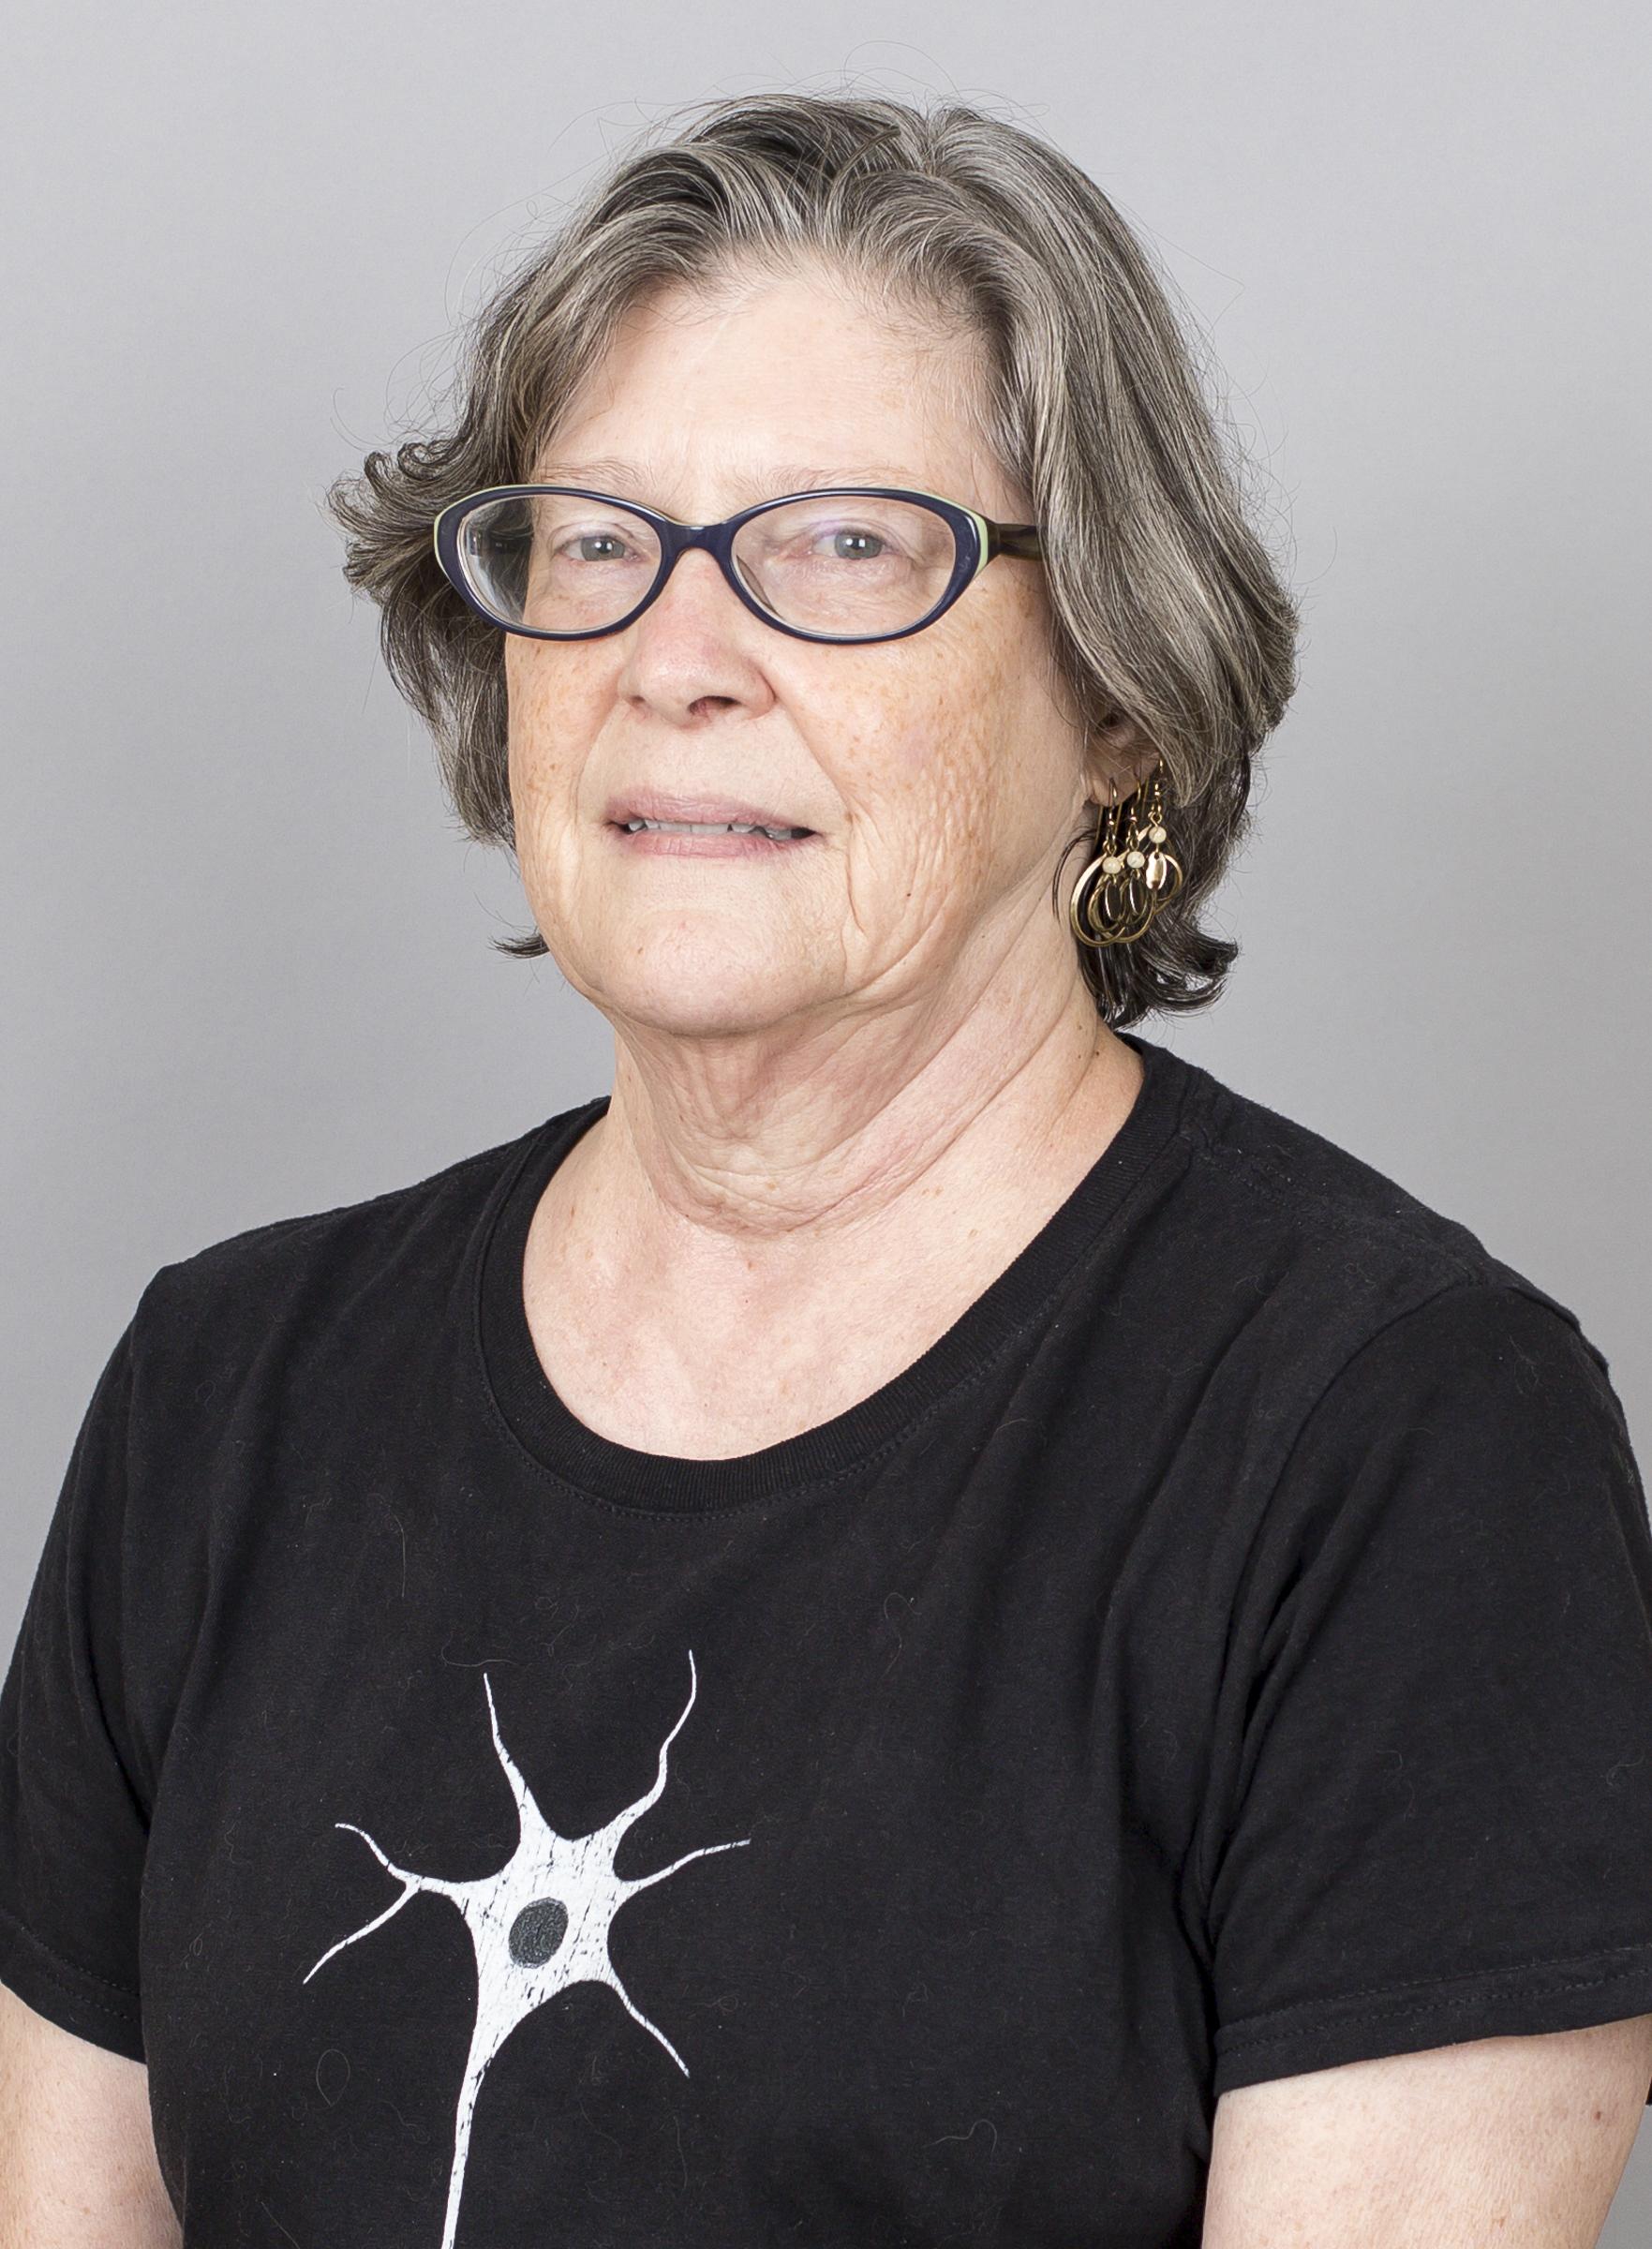 Joelle C. Presson - ASSISTANT DEAN, UNDERGRADUATE ACADEMIC PROGRAMS, COLLEGE OF COMPUTER, MATHEMATICAL, AND NATURAL SCIENCESjpresson@umd.edu